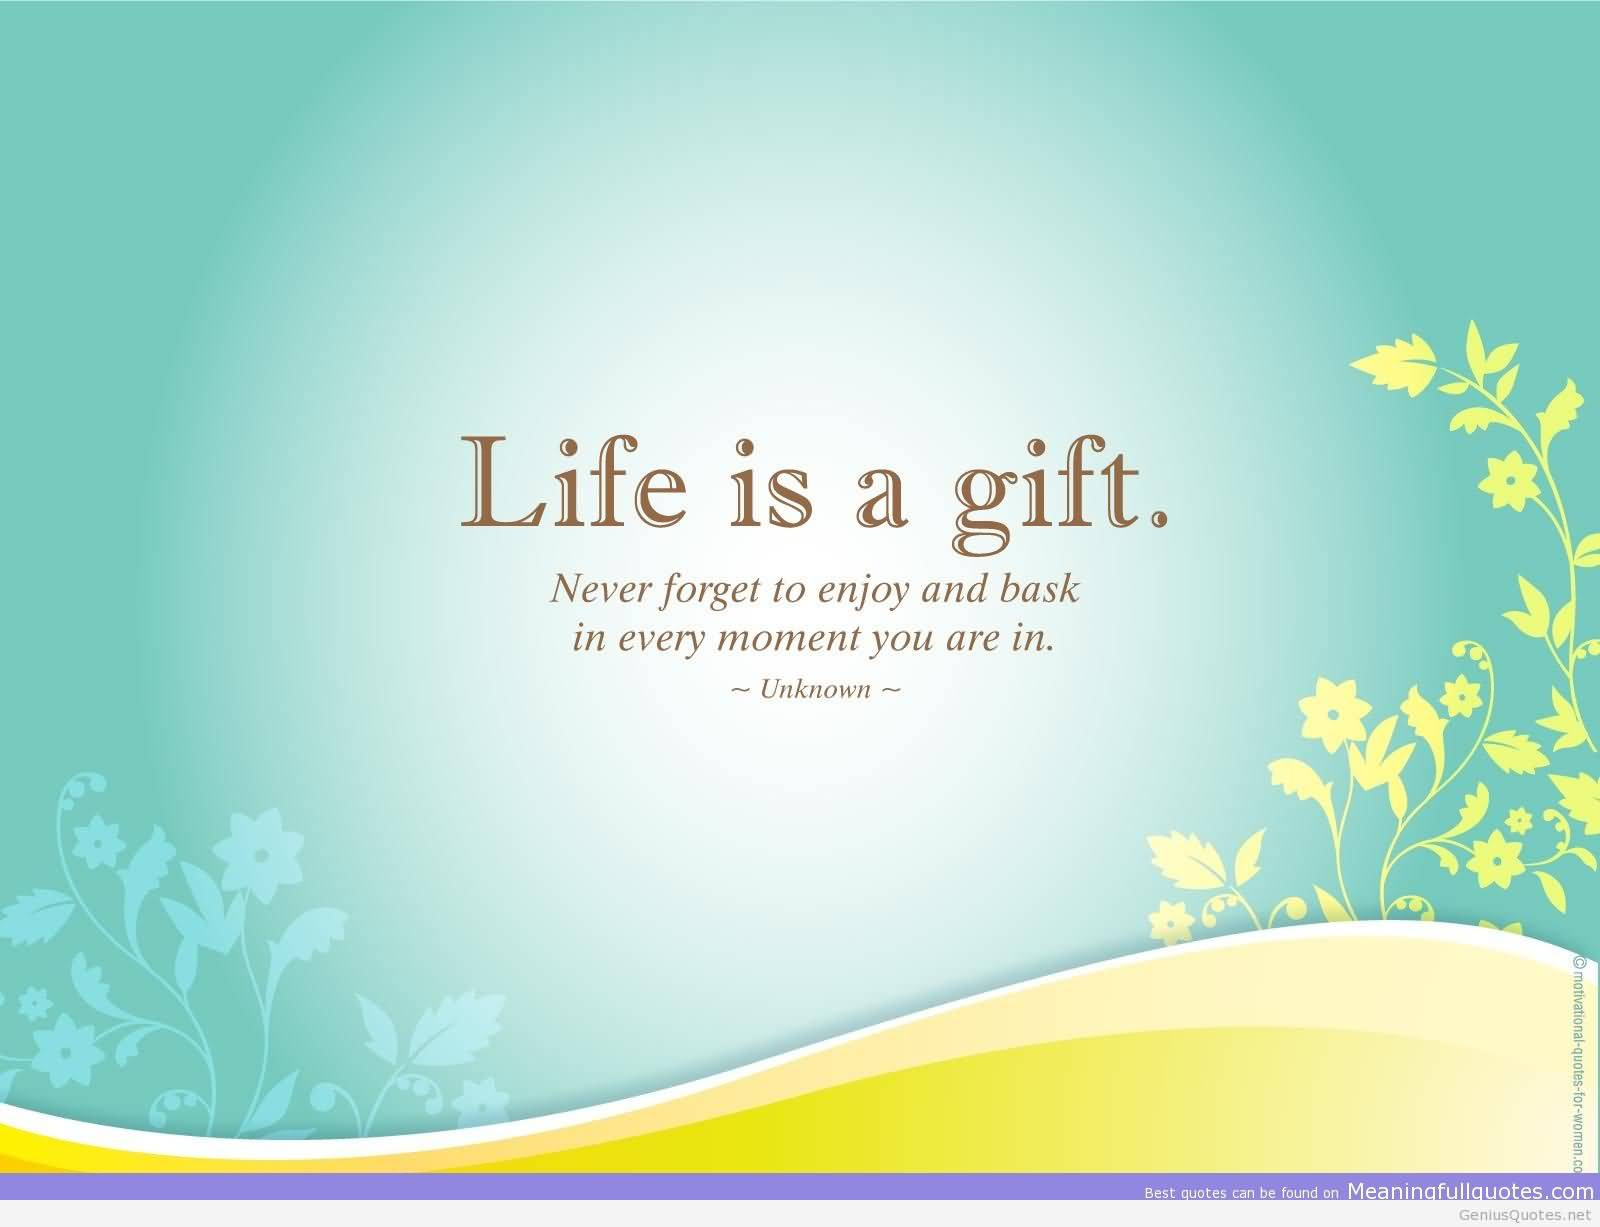 Celebrating Life Quotes Interesting Celebrating Another Year Of Life Quotes  Meme Image 16 Quotesbae